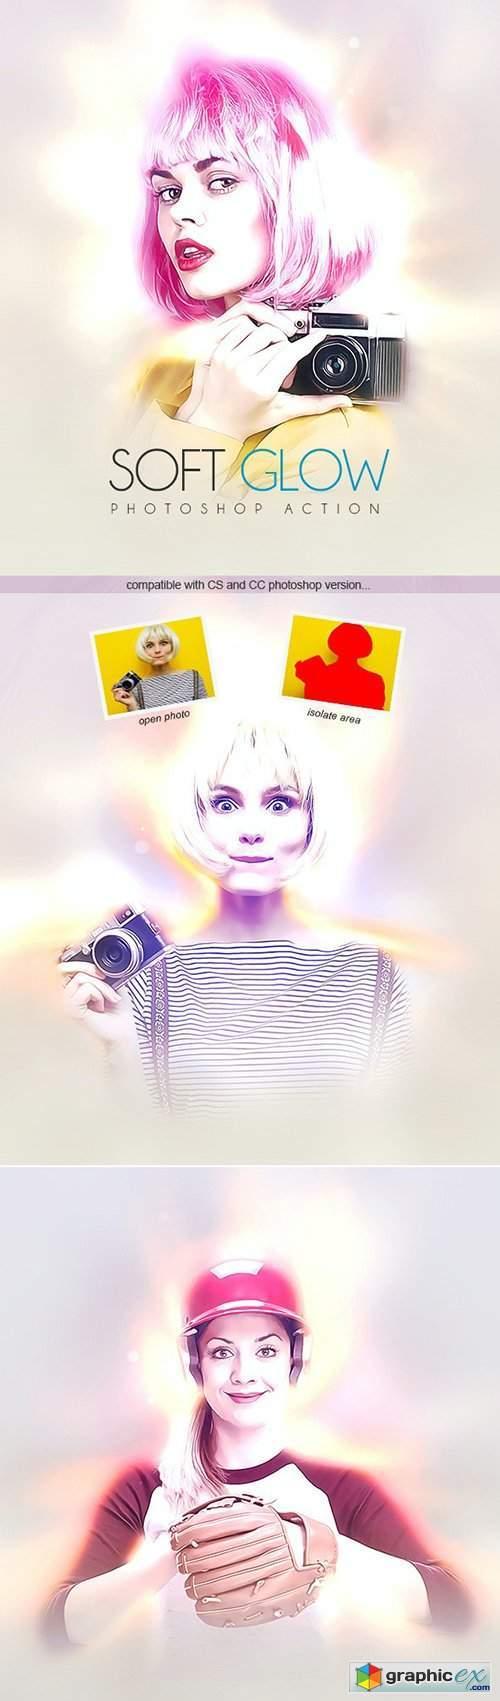 Soft Glow - Photoshop Action 31672932